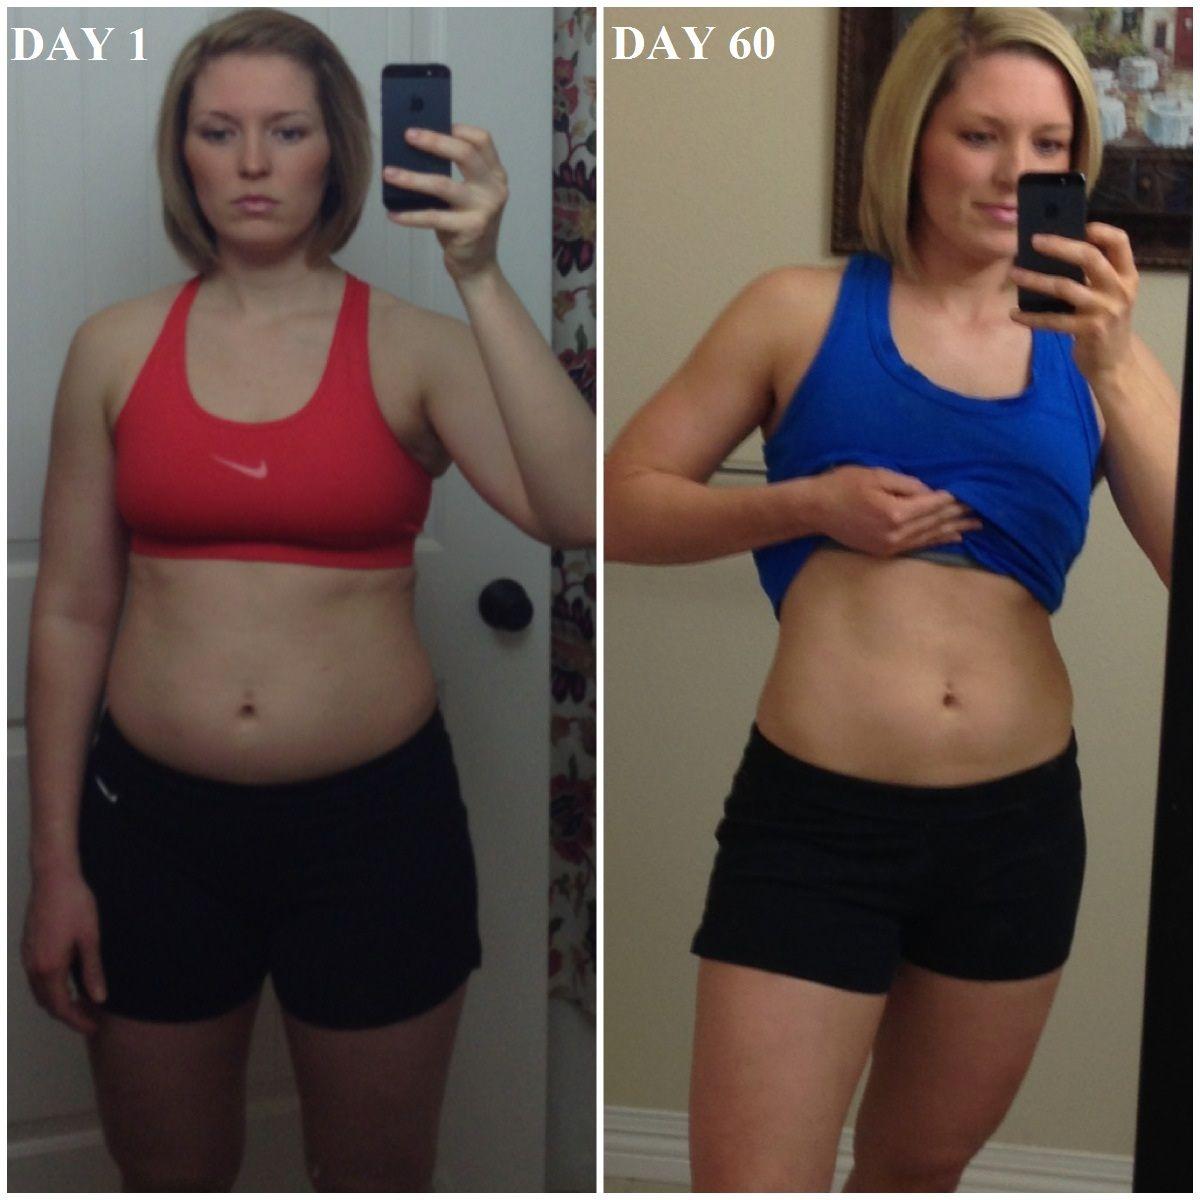 12 week diet plan to get ripped image 5